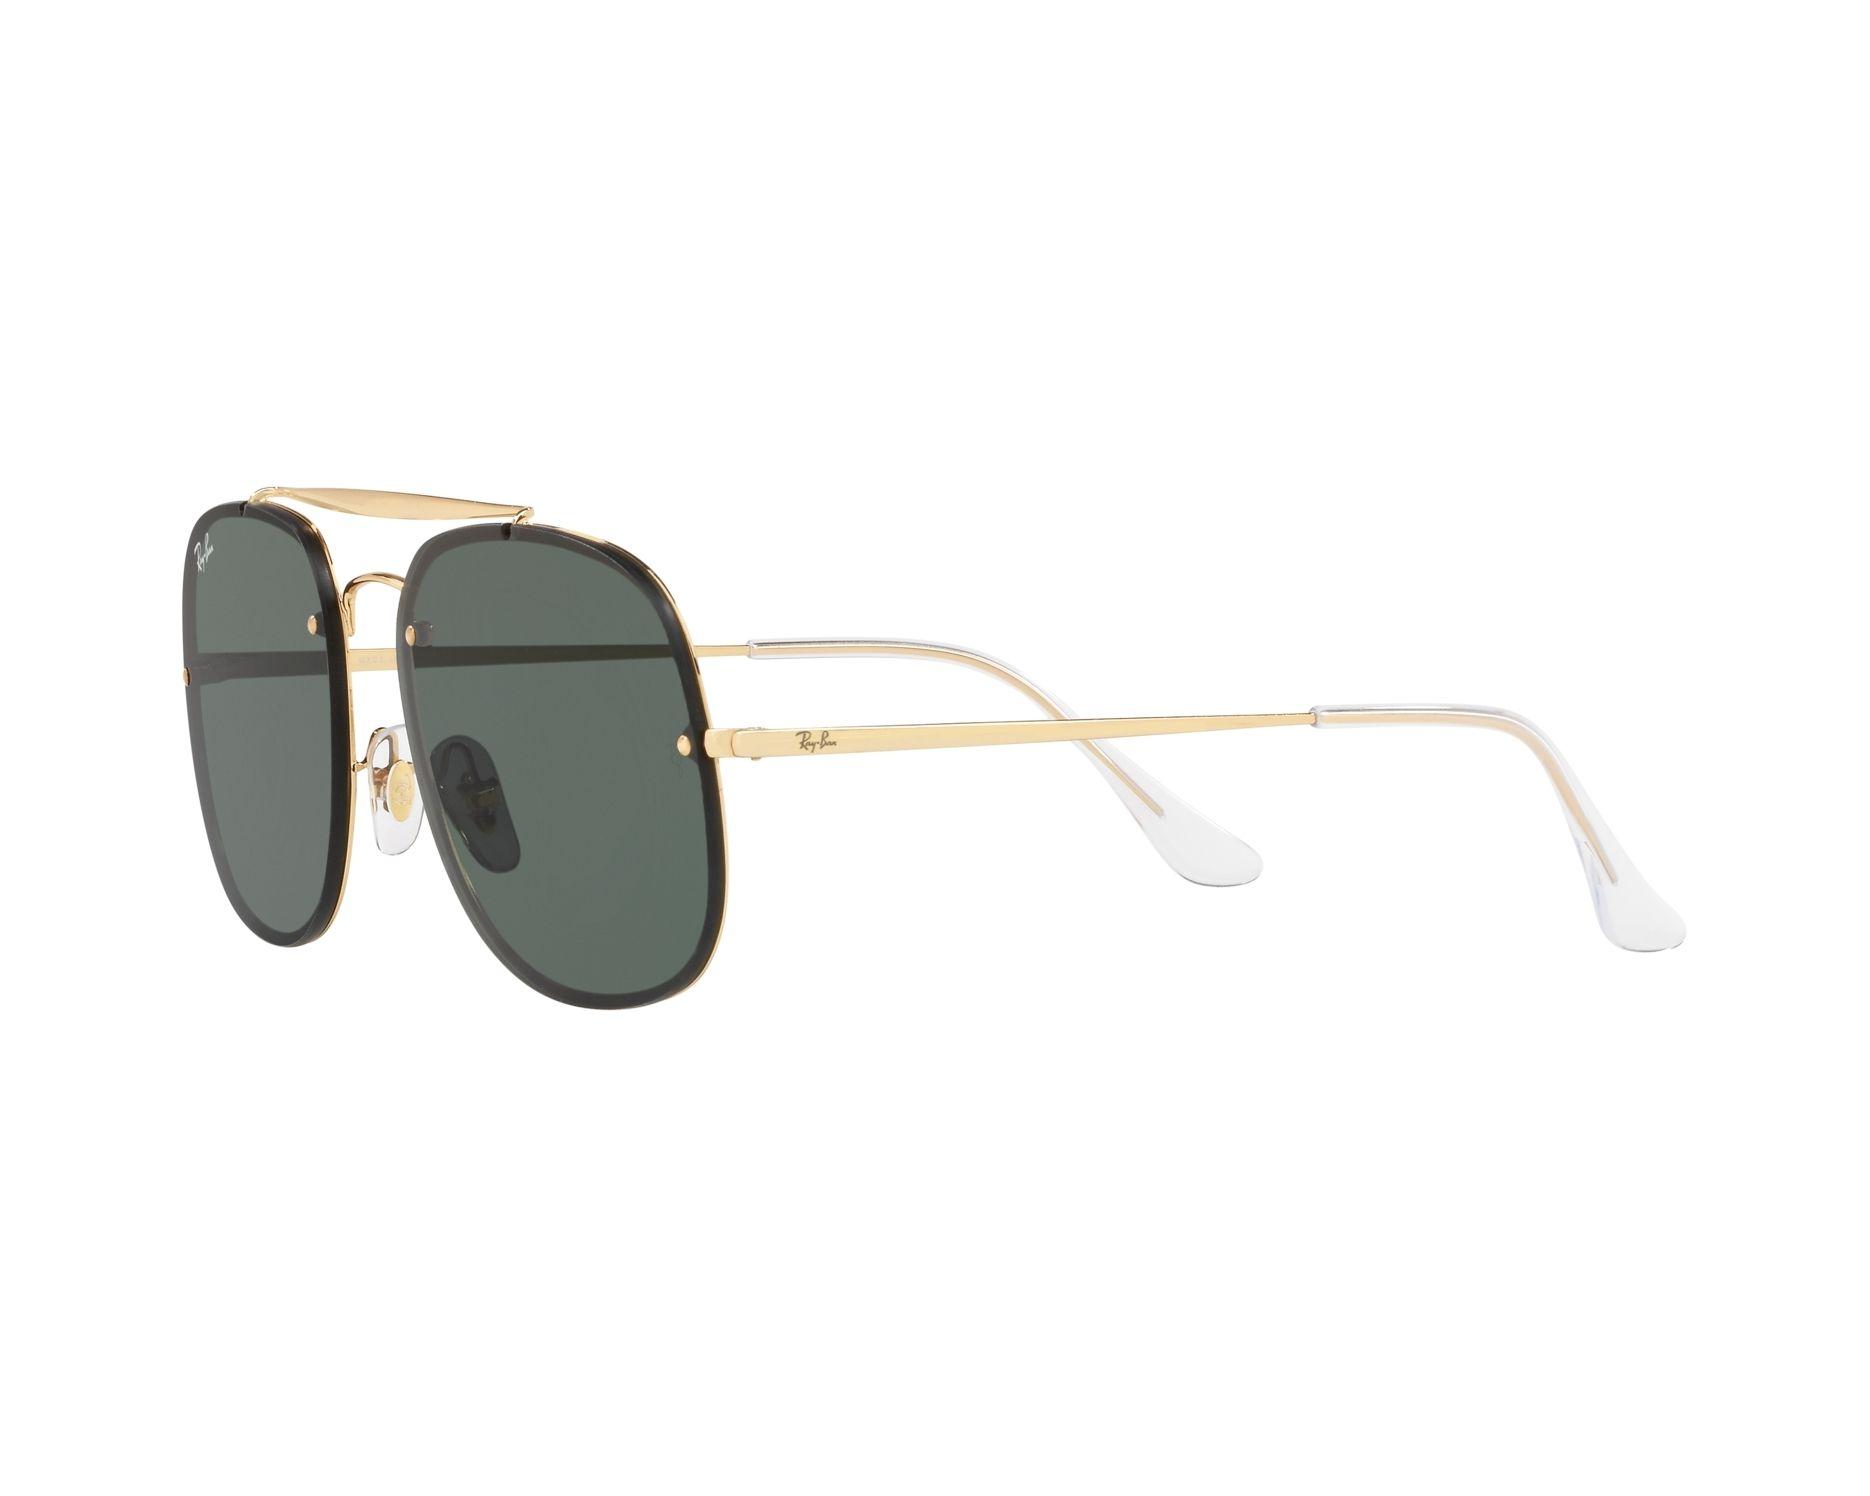 f713d1b6069 Sunglasses Ray-Ban RB-3583-N 905071 58-16 Gold 360 degree